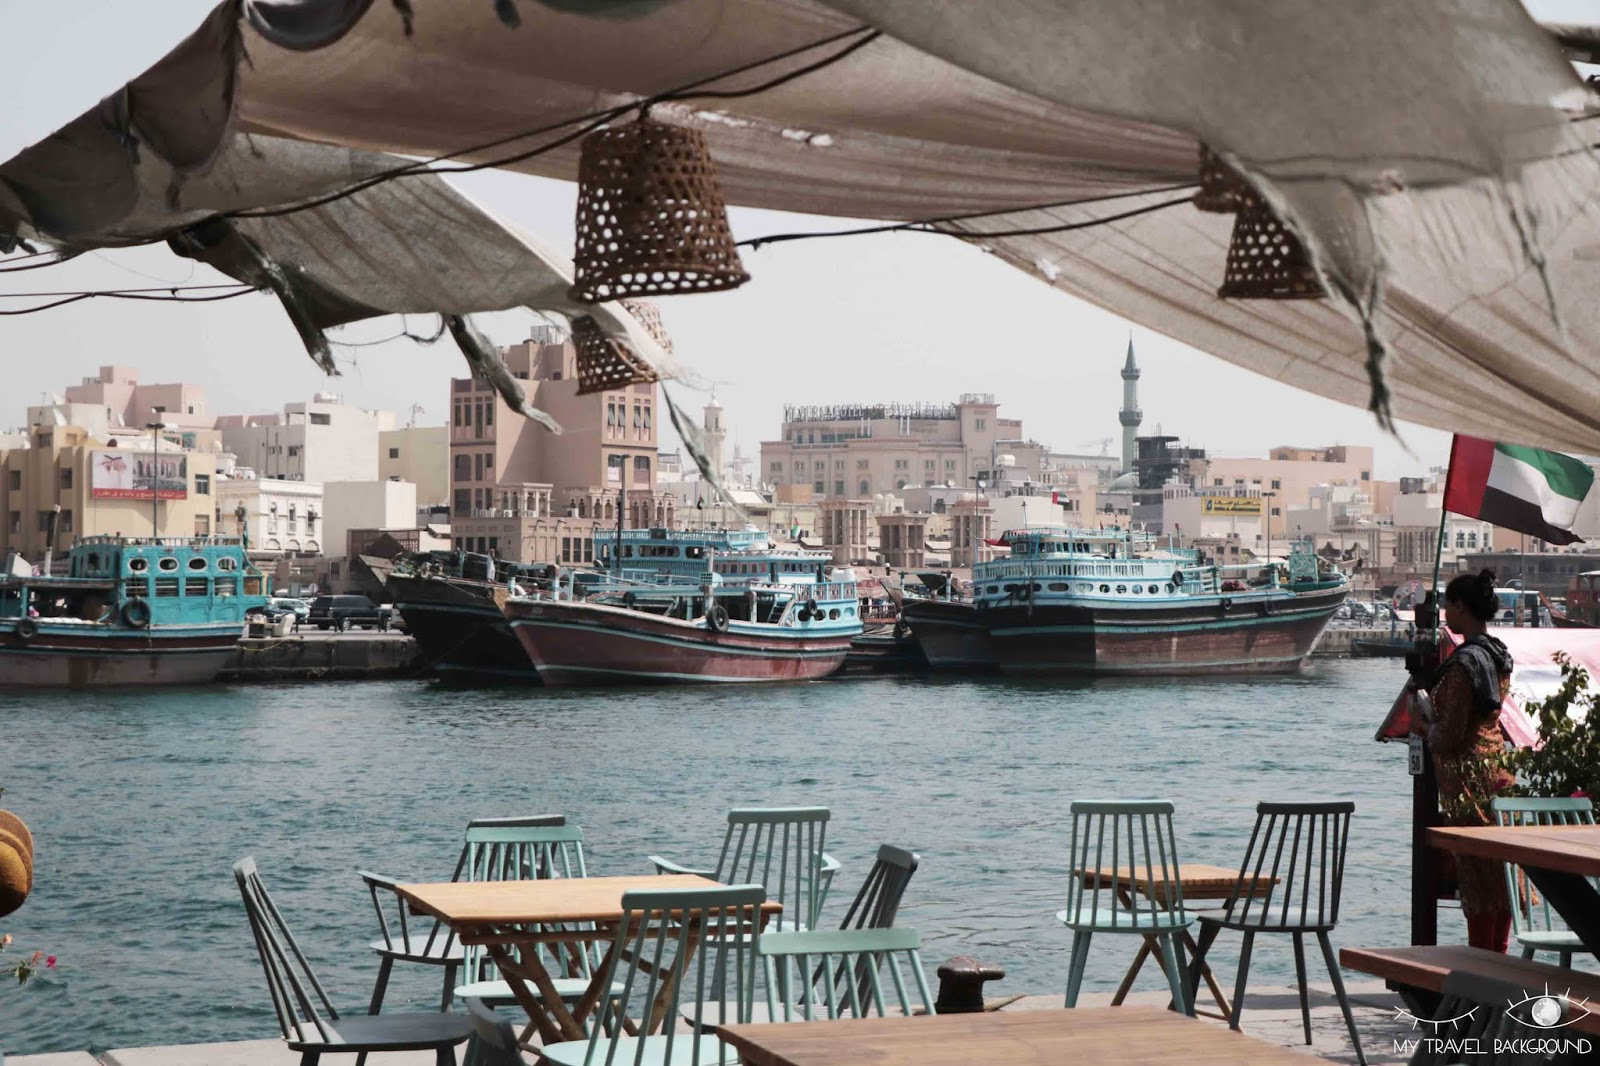 My Travel Background : cartes postales des Emirats Arabes Unis - Dubaï en 2018